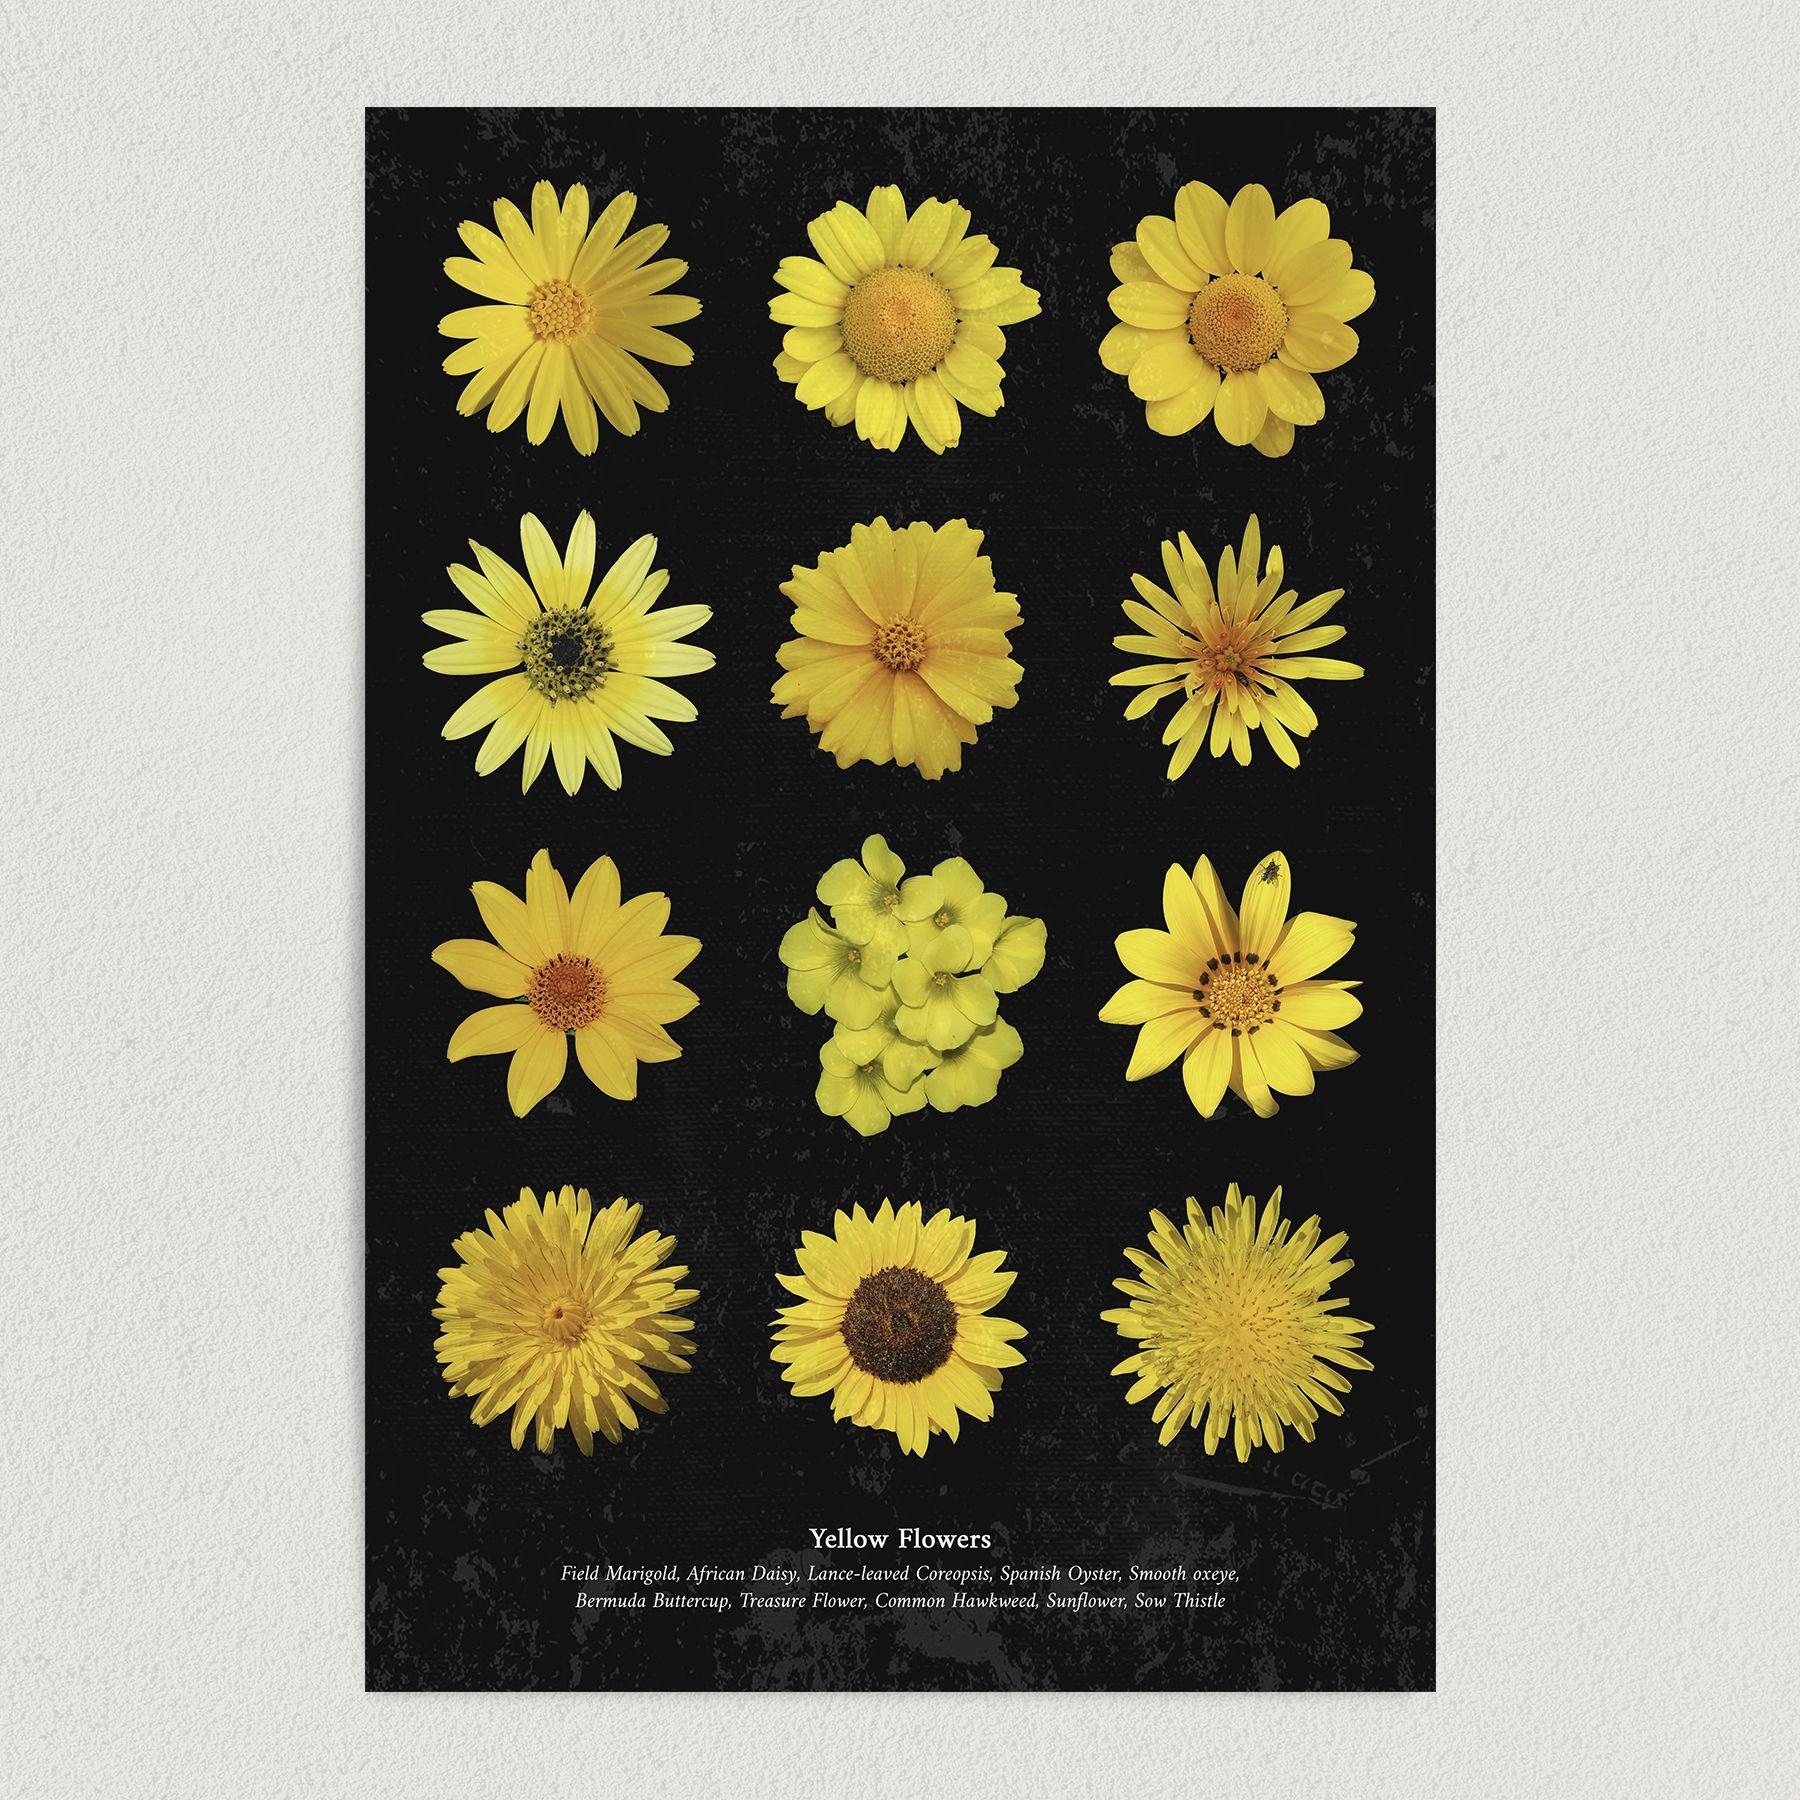 Yellow Flowers Art Print Poster 12″ x 18″ Wall Art GC3001